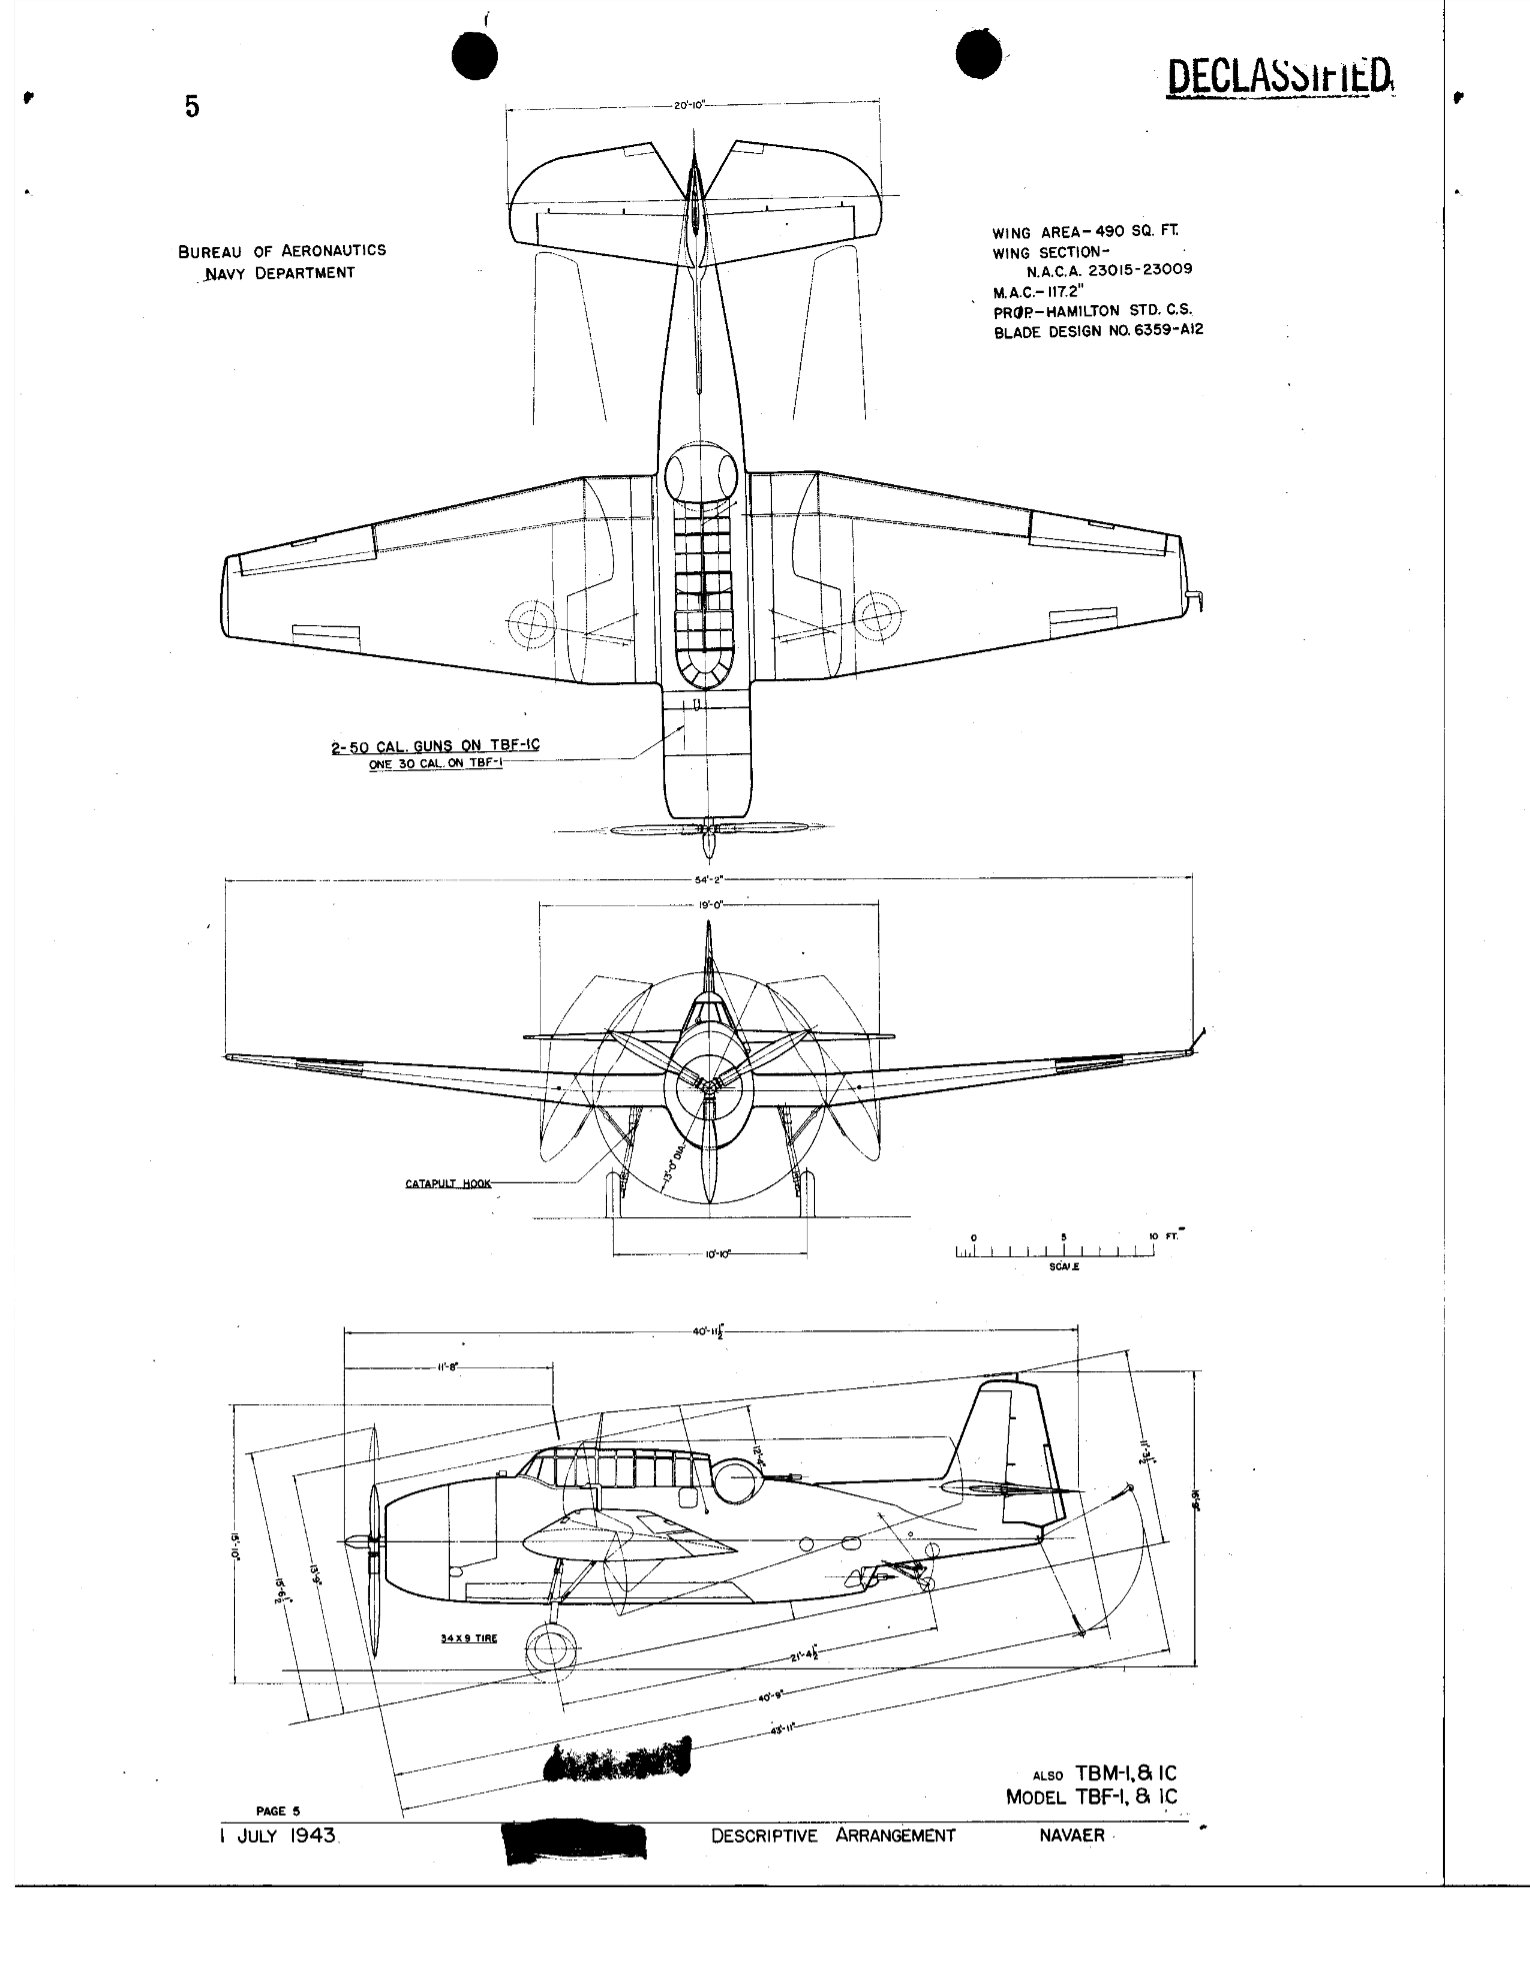 The pacific war online encyclopedia tbf avenger u s carrier rh encycl kgbudge f4u corsair tbm